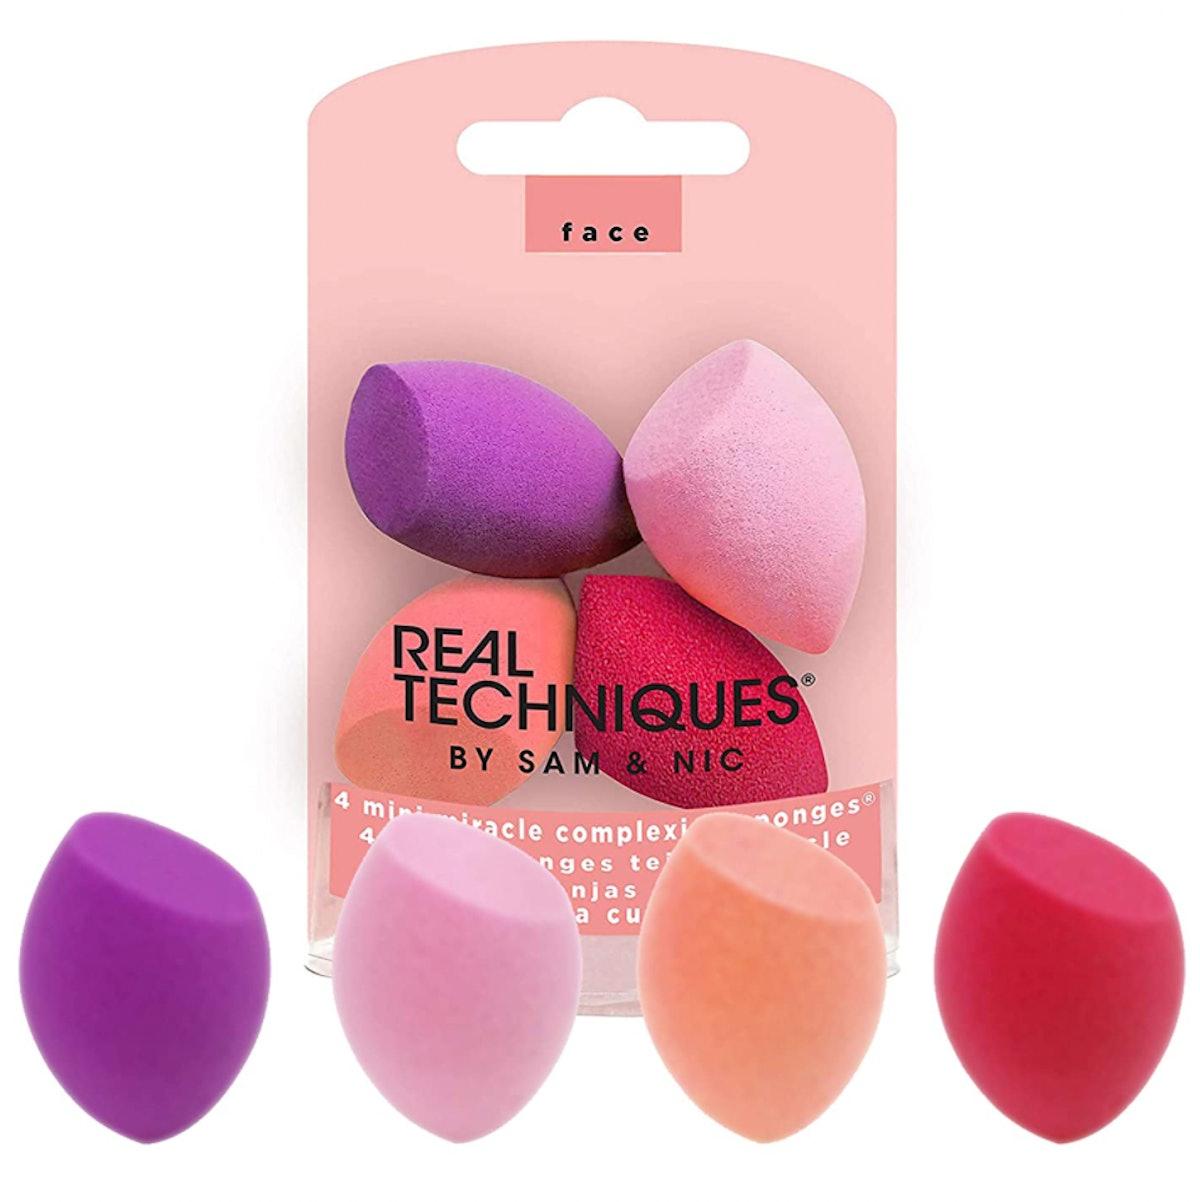 Real Techniques Mini Miracle Complexion Sponges (4-Pack)